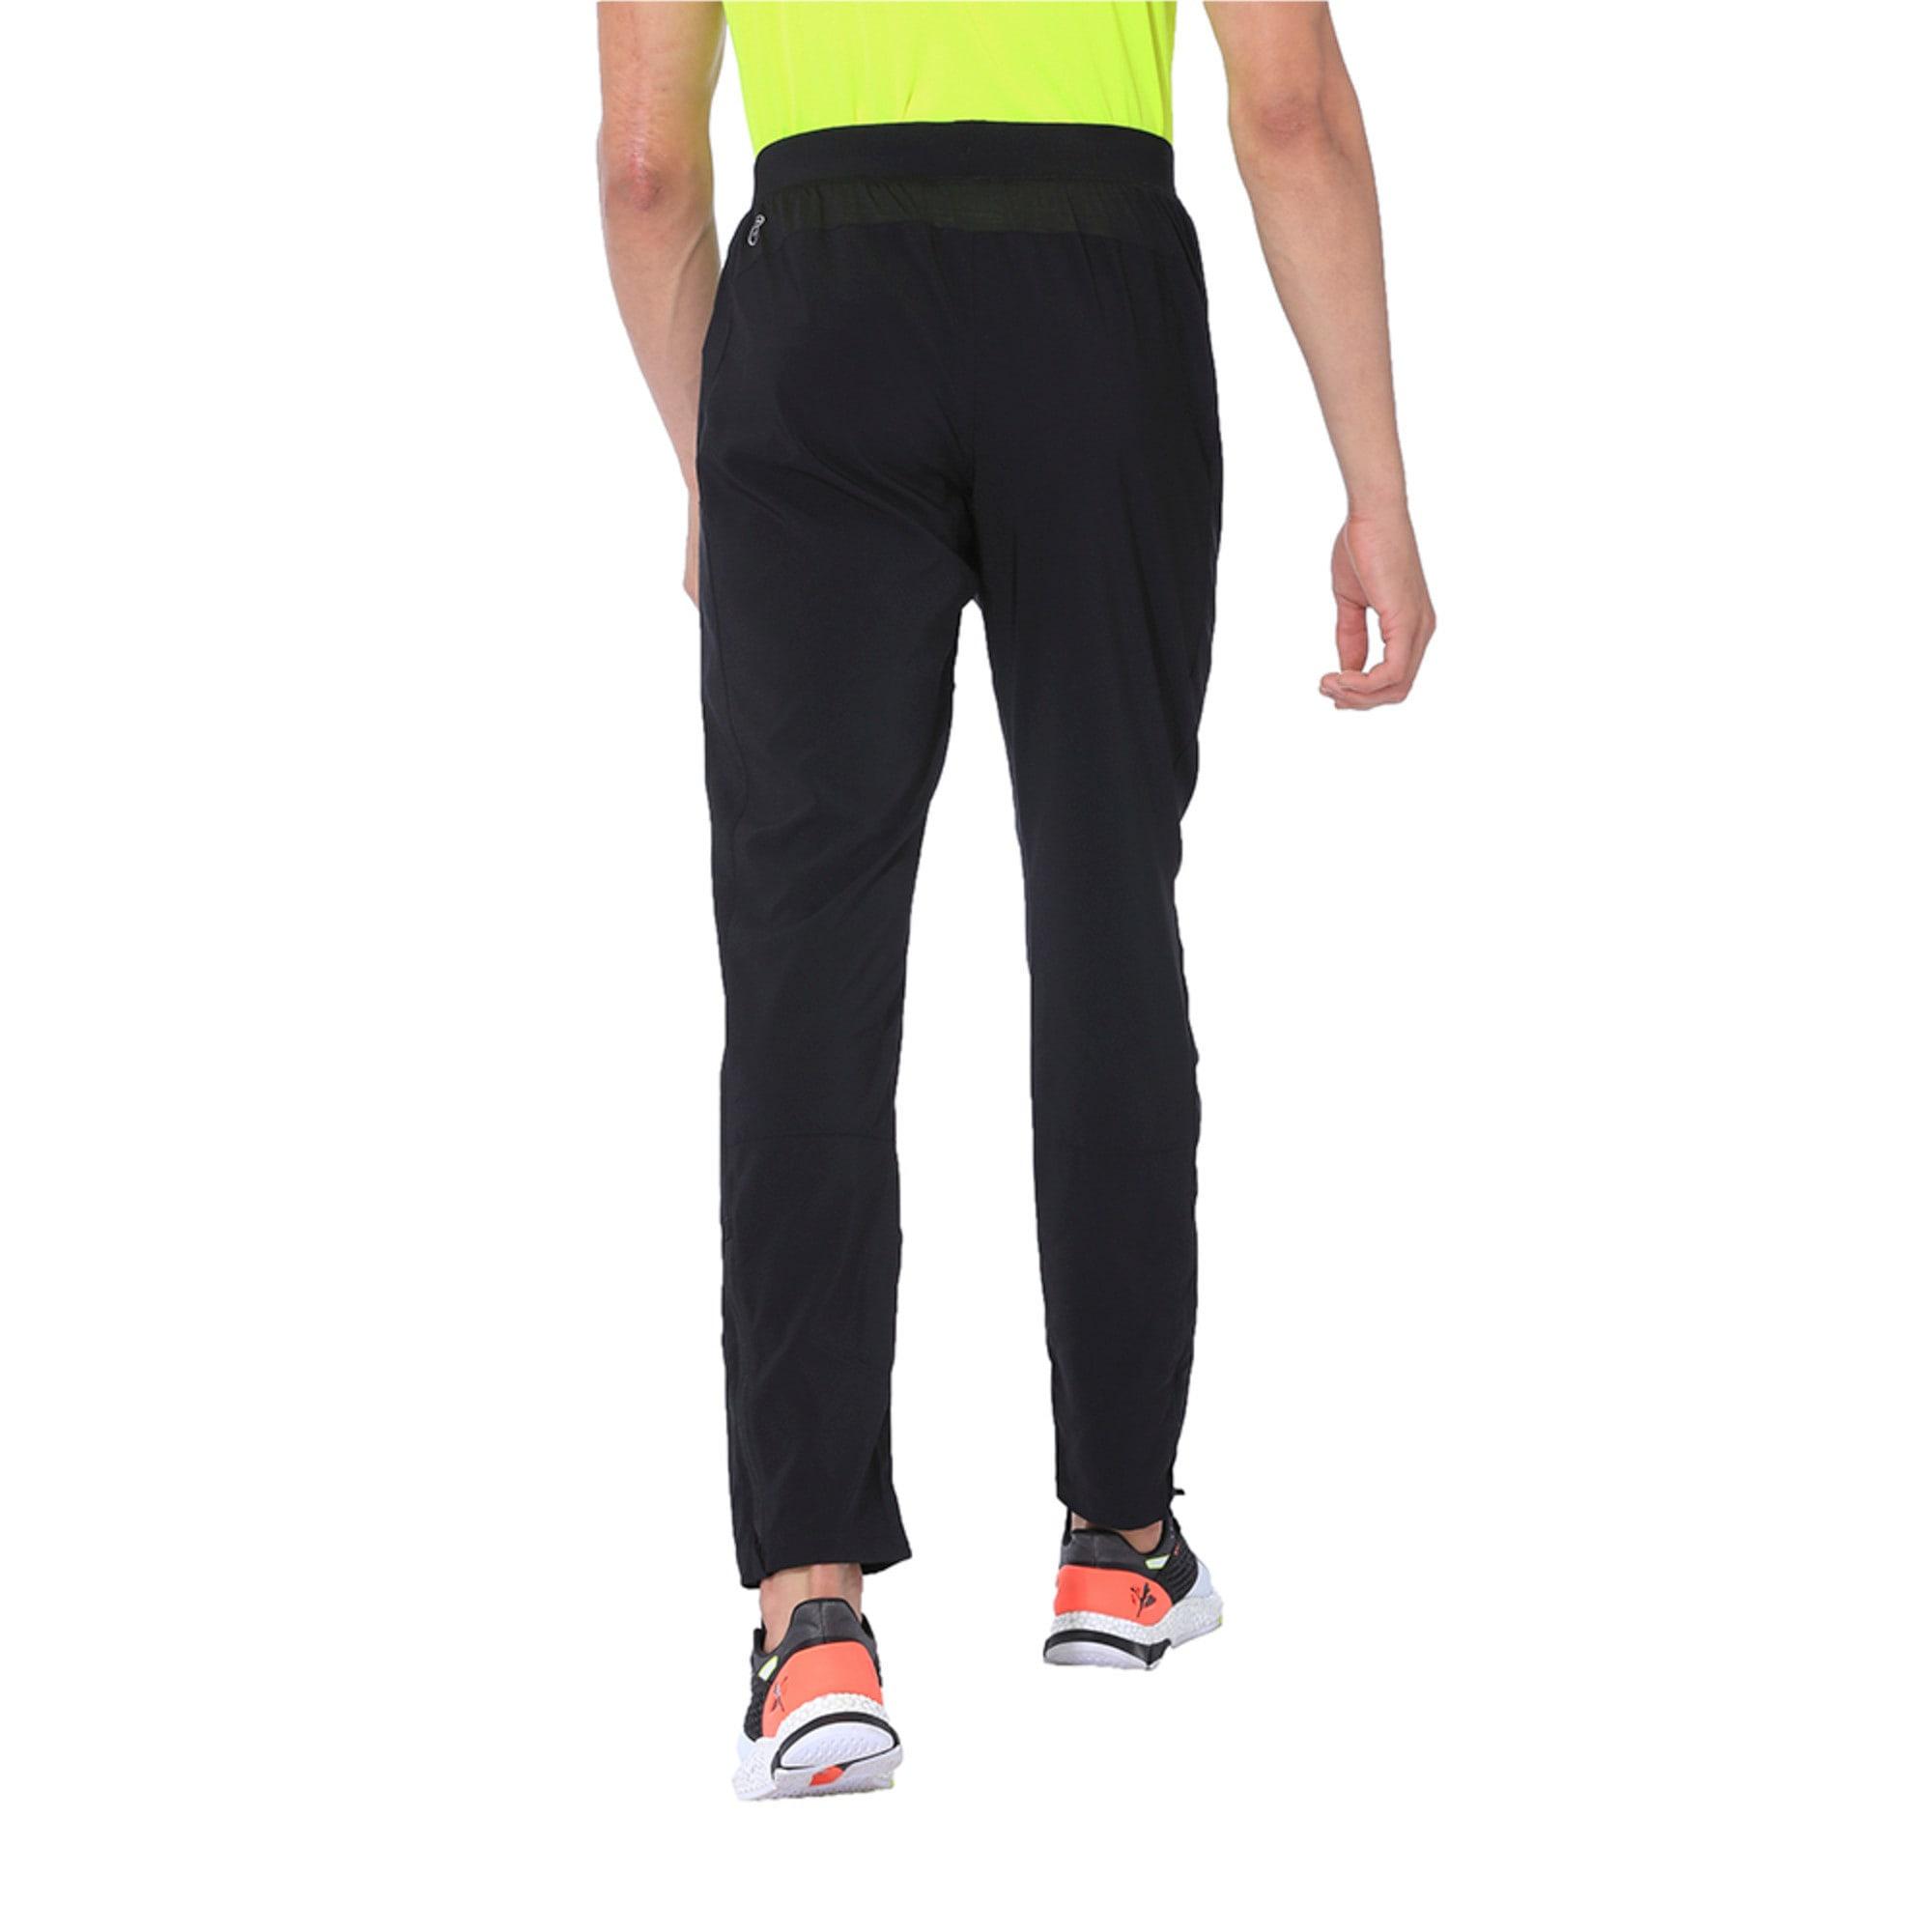 Thumbnail 2 of Tapered Woven Men's Running Pants, Puma Black, medium-IND